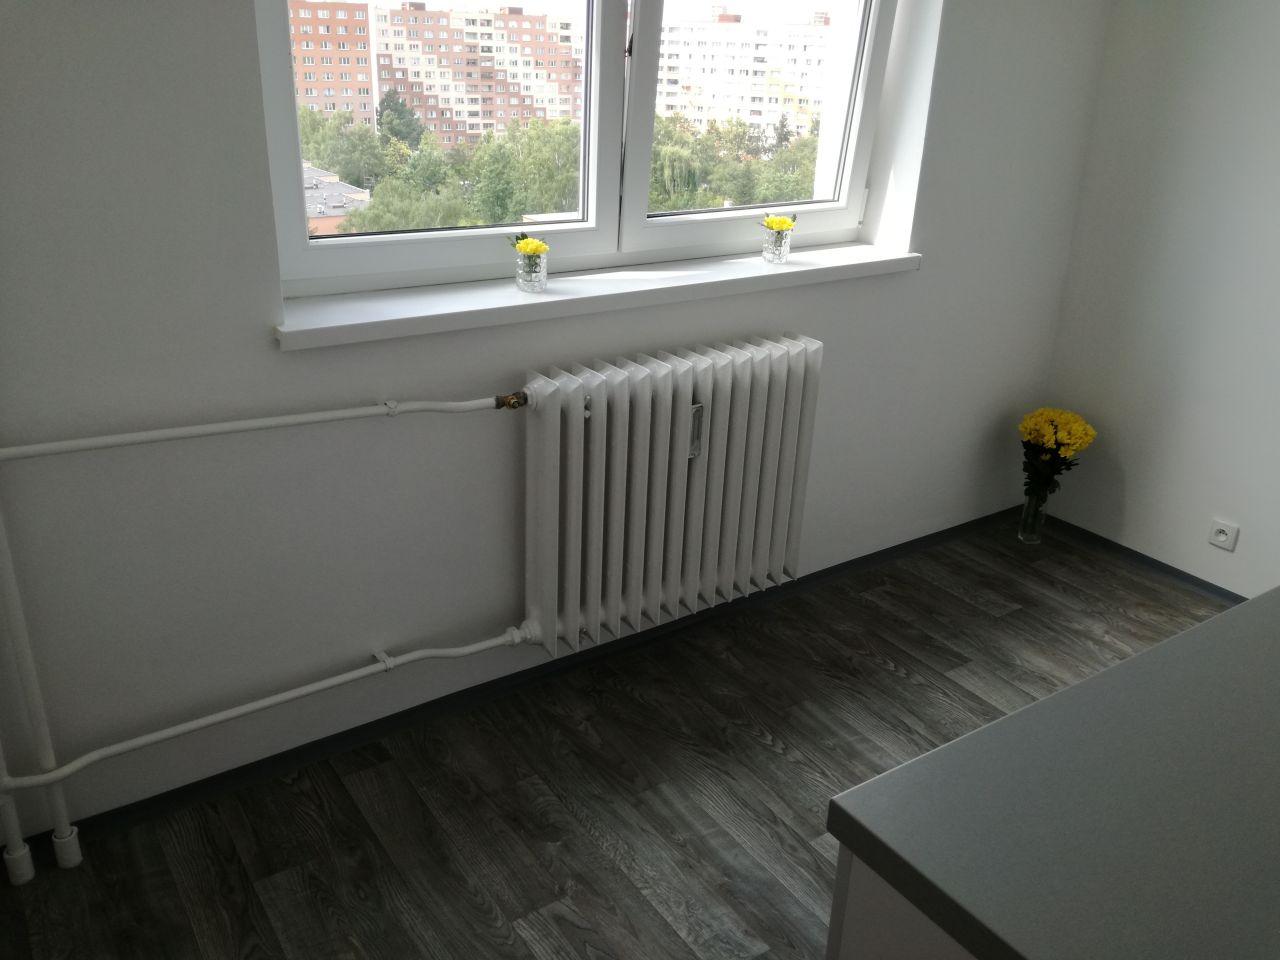 Pronájem bytu 2+1 52 m2, ul. Krestova 1303/34, Ostrava - Hrabůvka